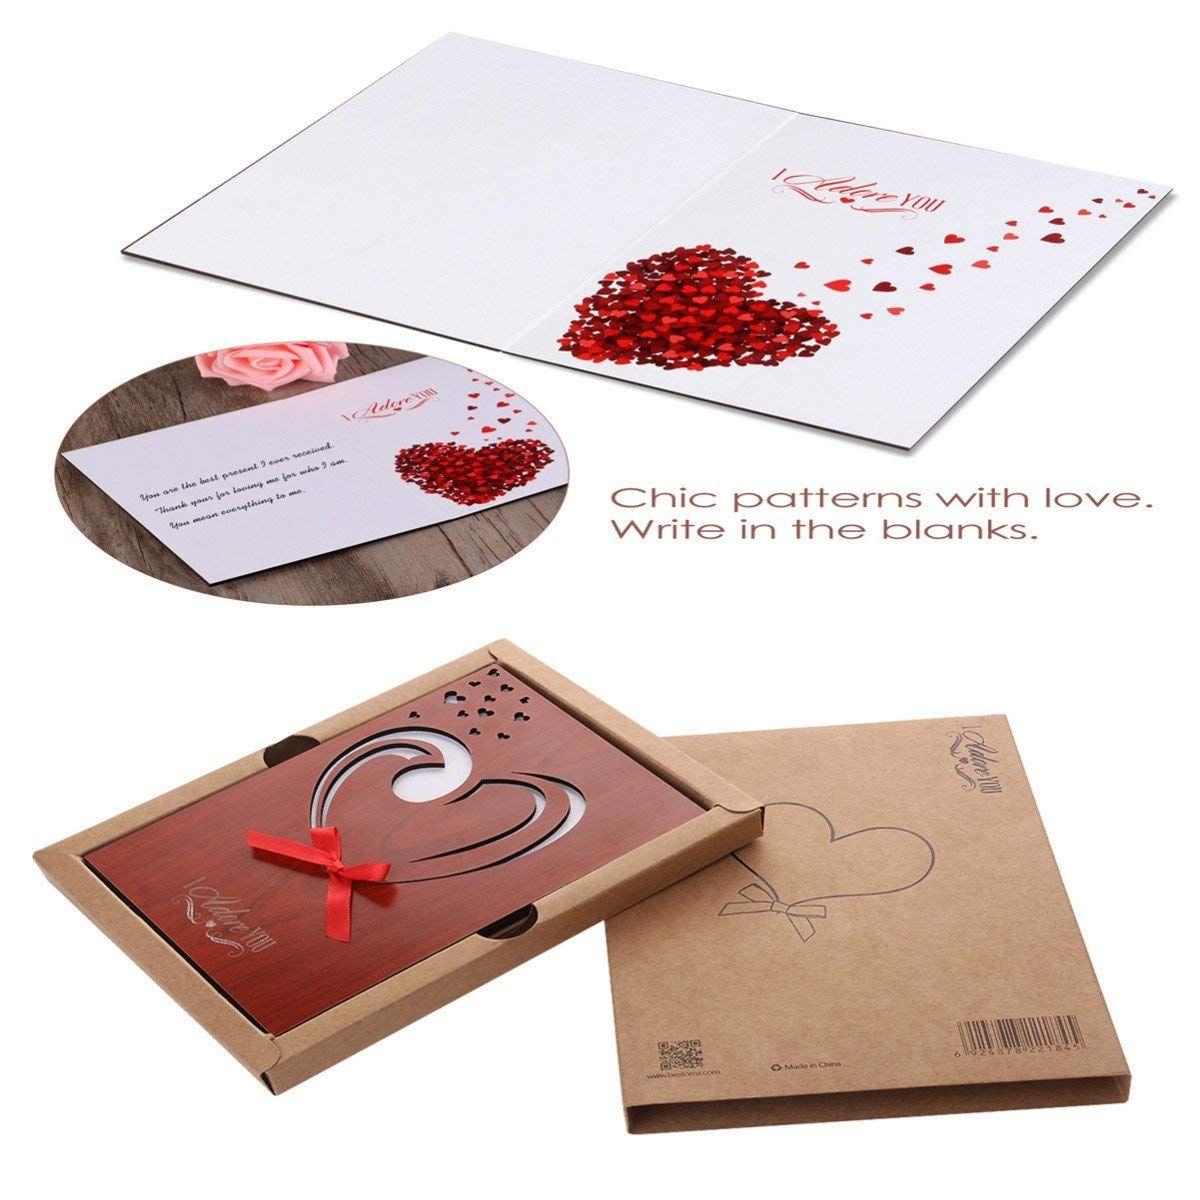 £7 99 unomor love card imitation wood greeting card for anniversariesbirthdays weddings